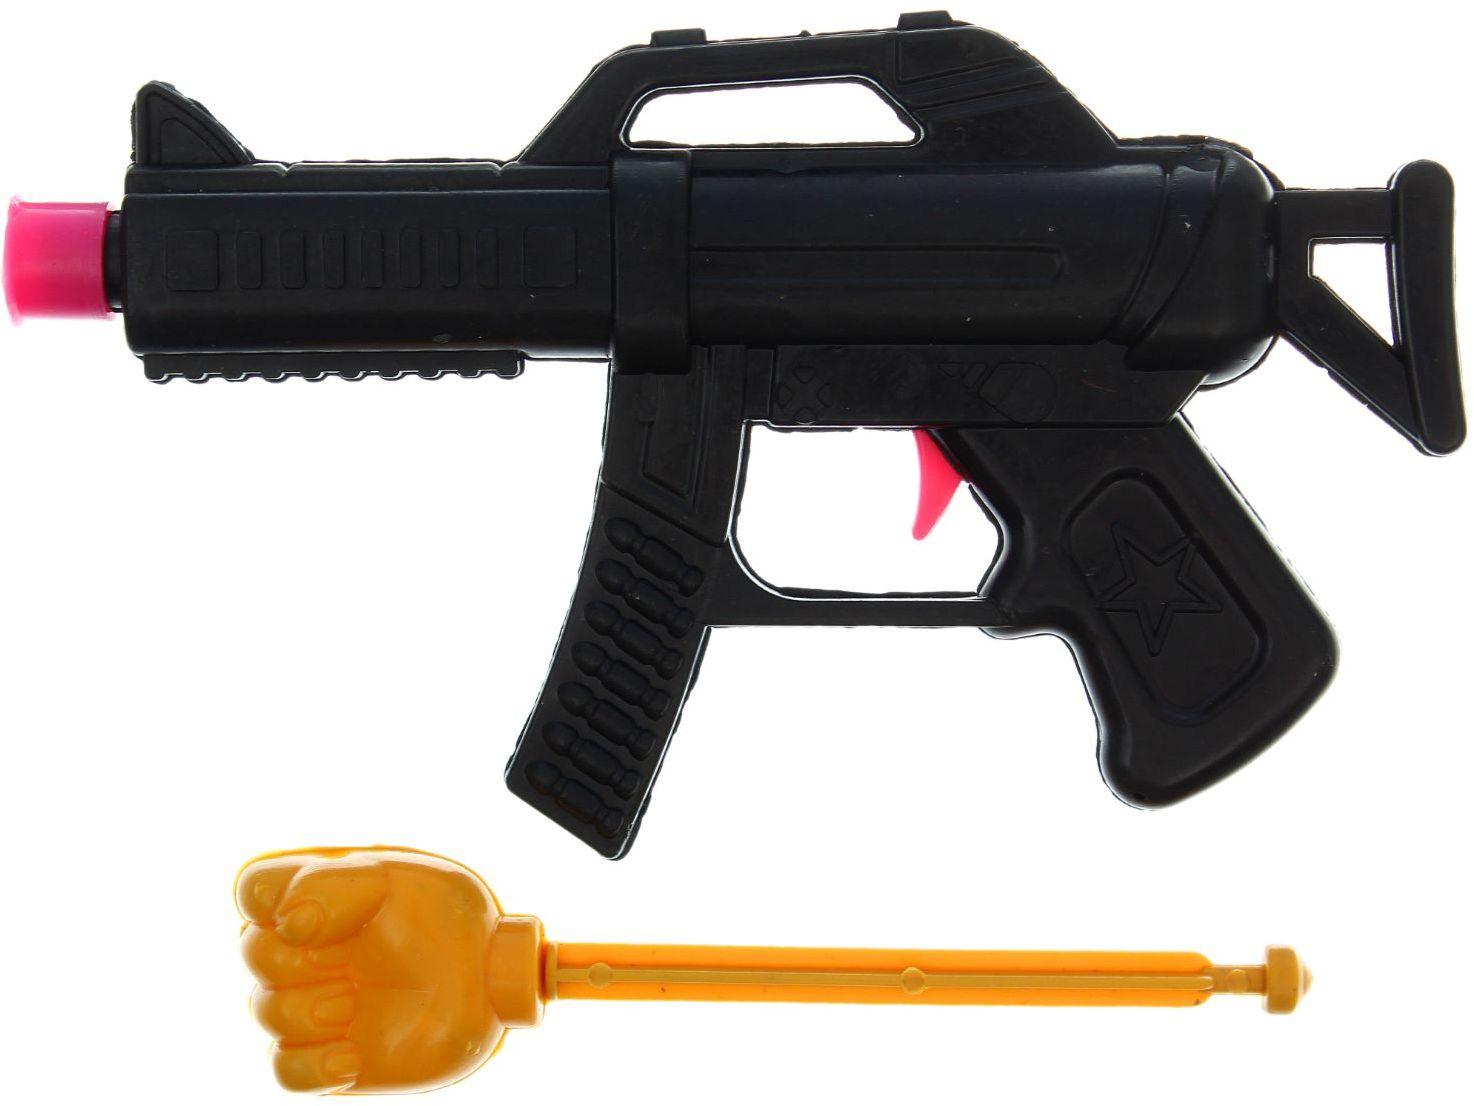 Sima-land Стрелялка Автомат 1640263